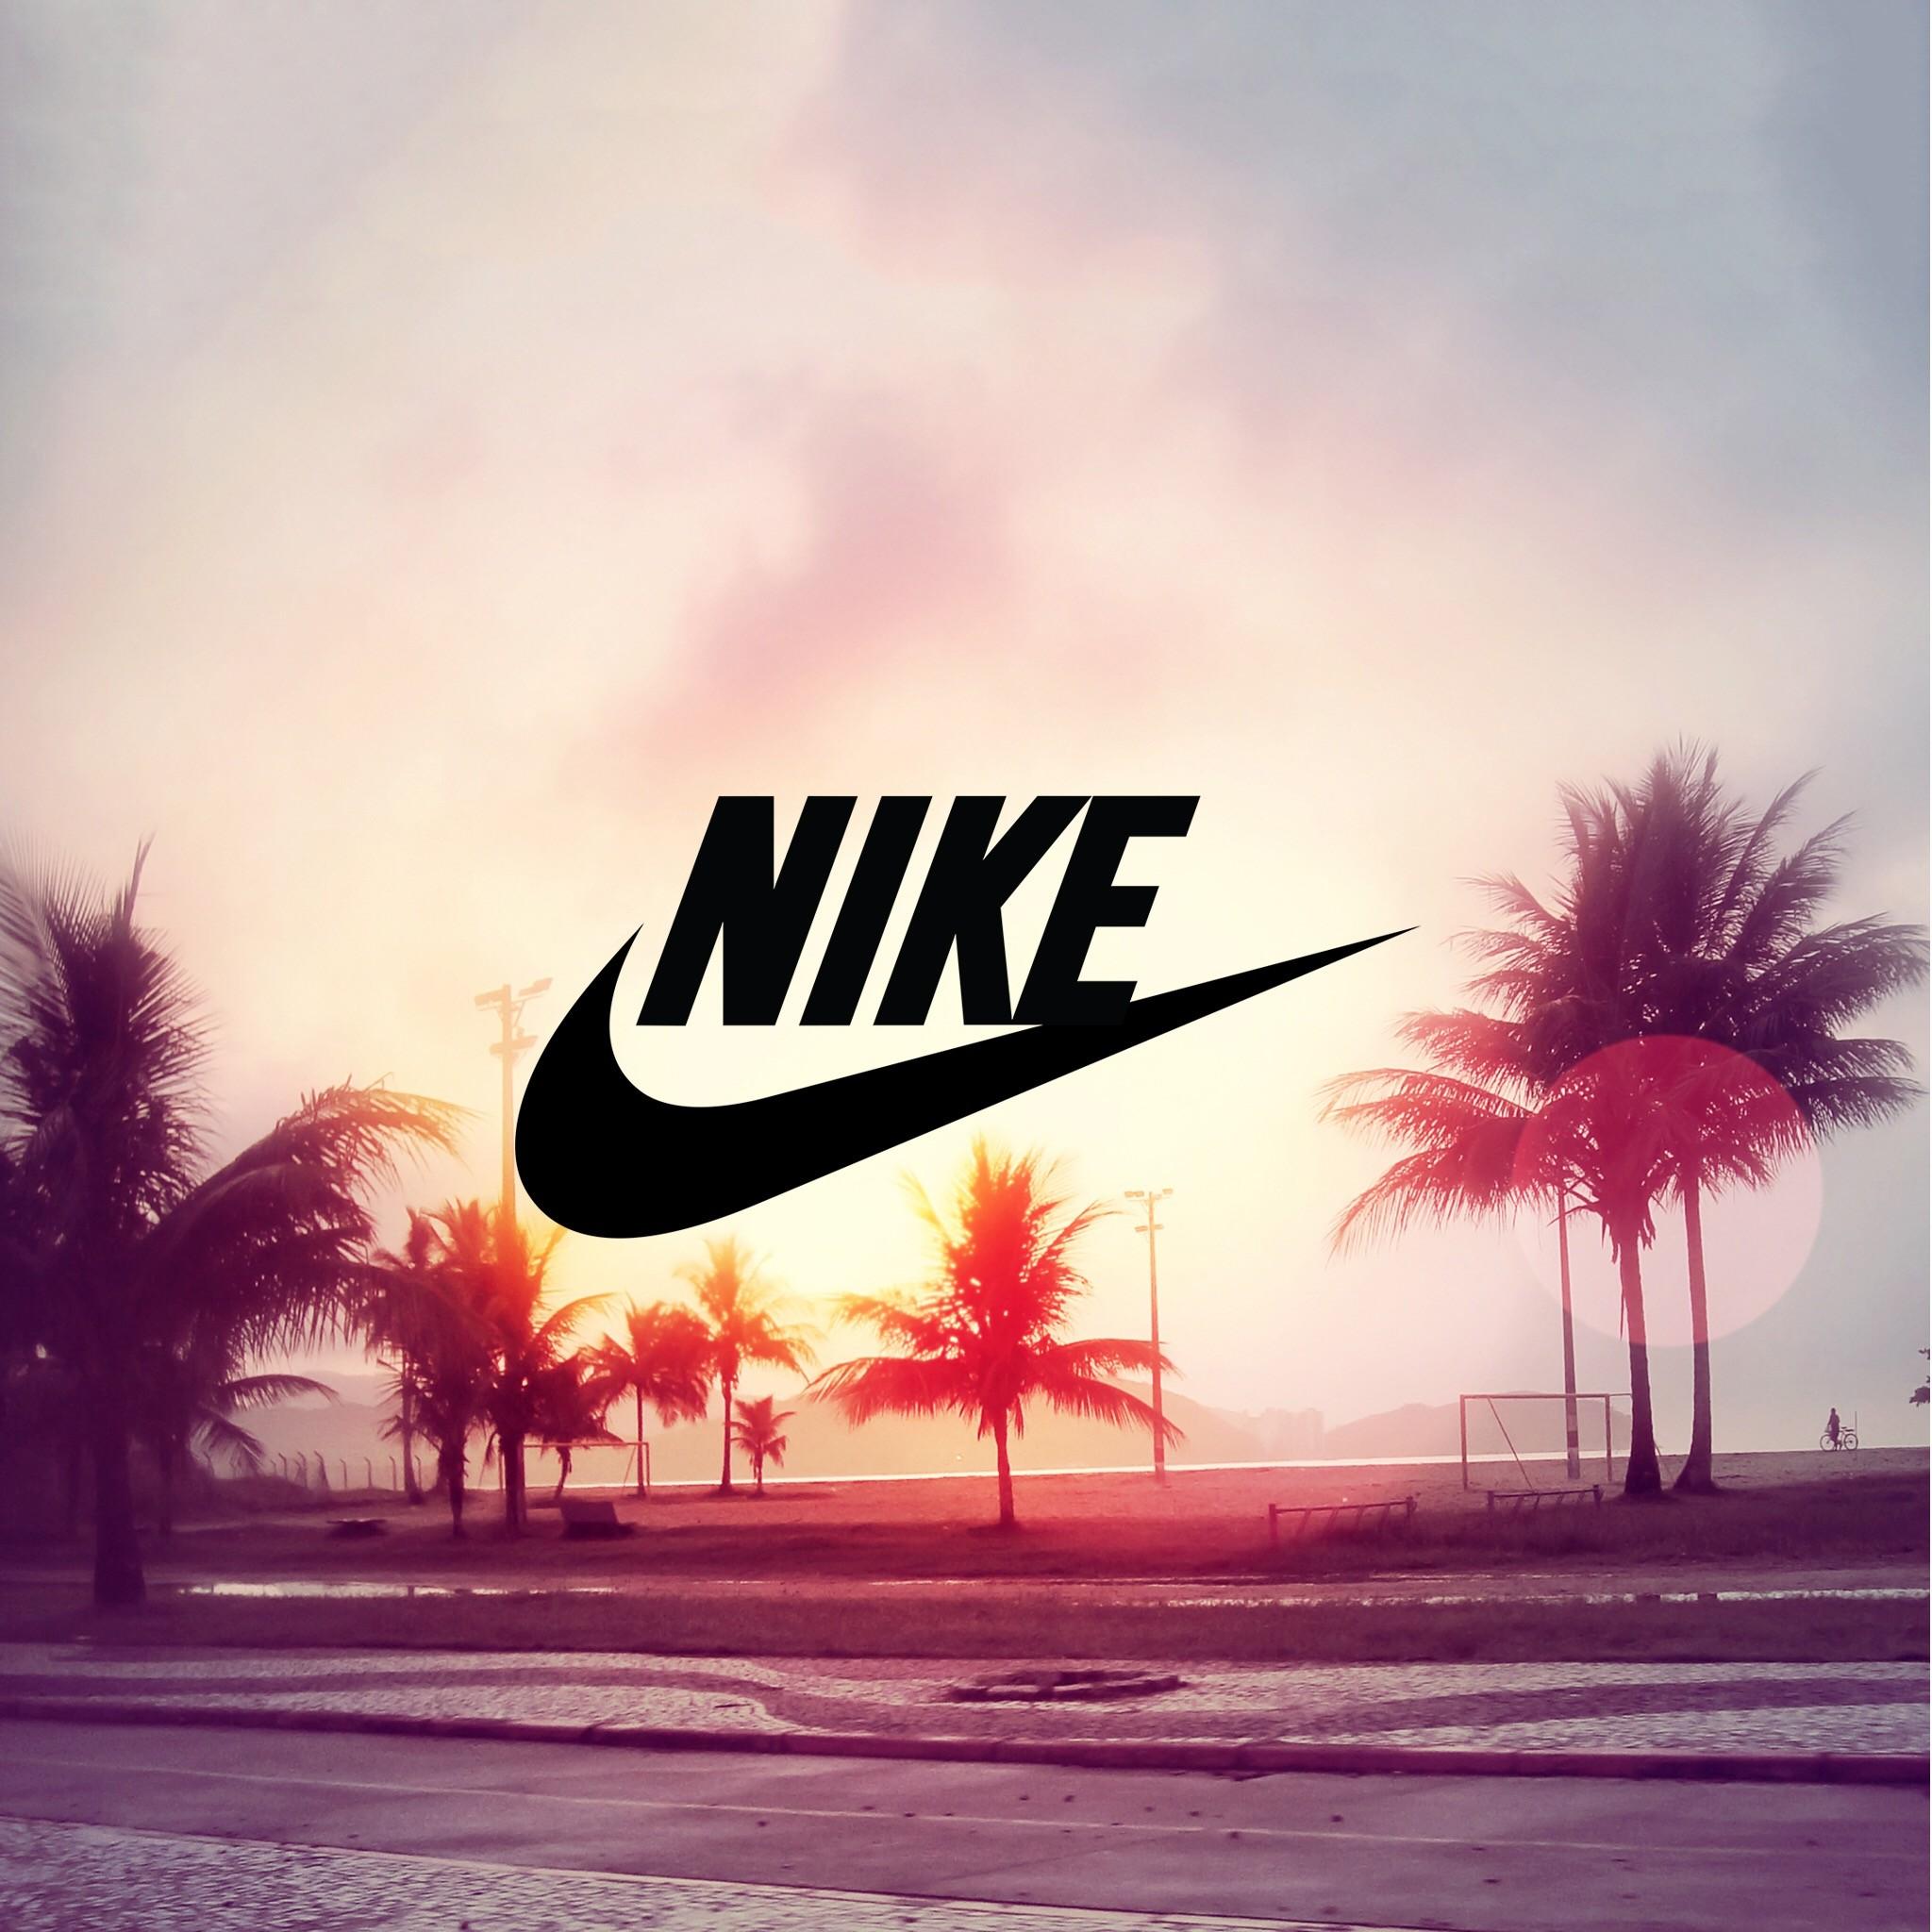 Apple 3d Hd Wallpaper For Iphone Die 76 Besten Nike Hintergrundbilder